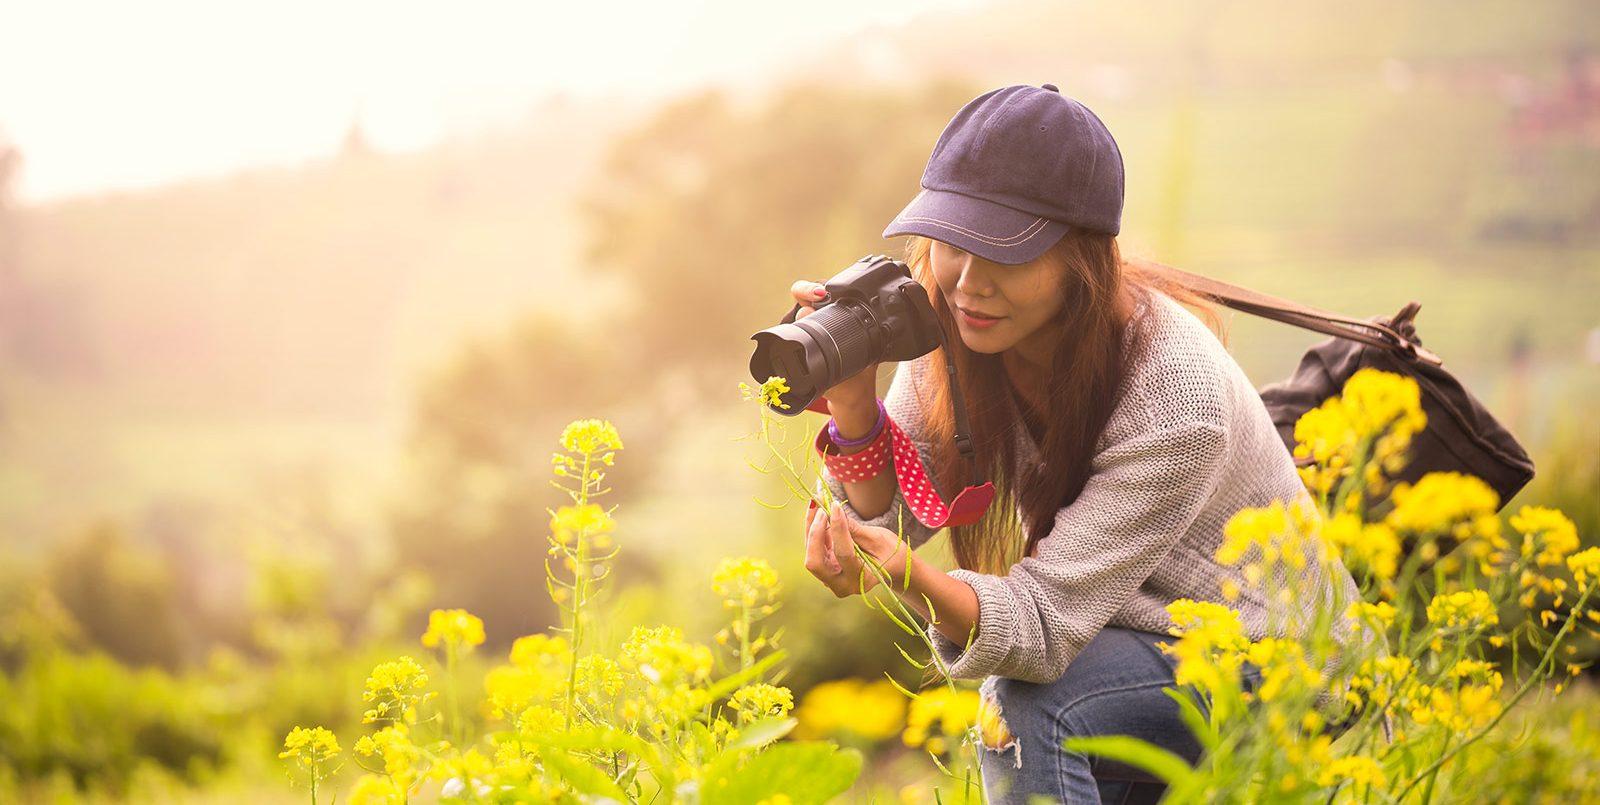 ideas for summer wildlife photography